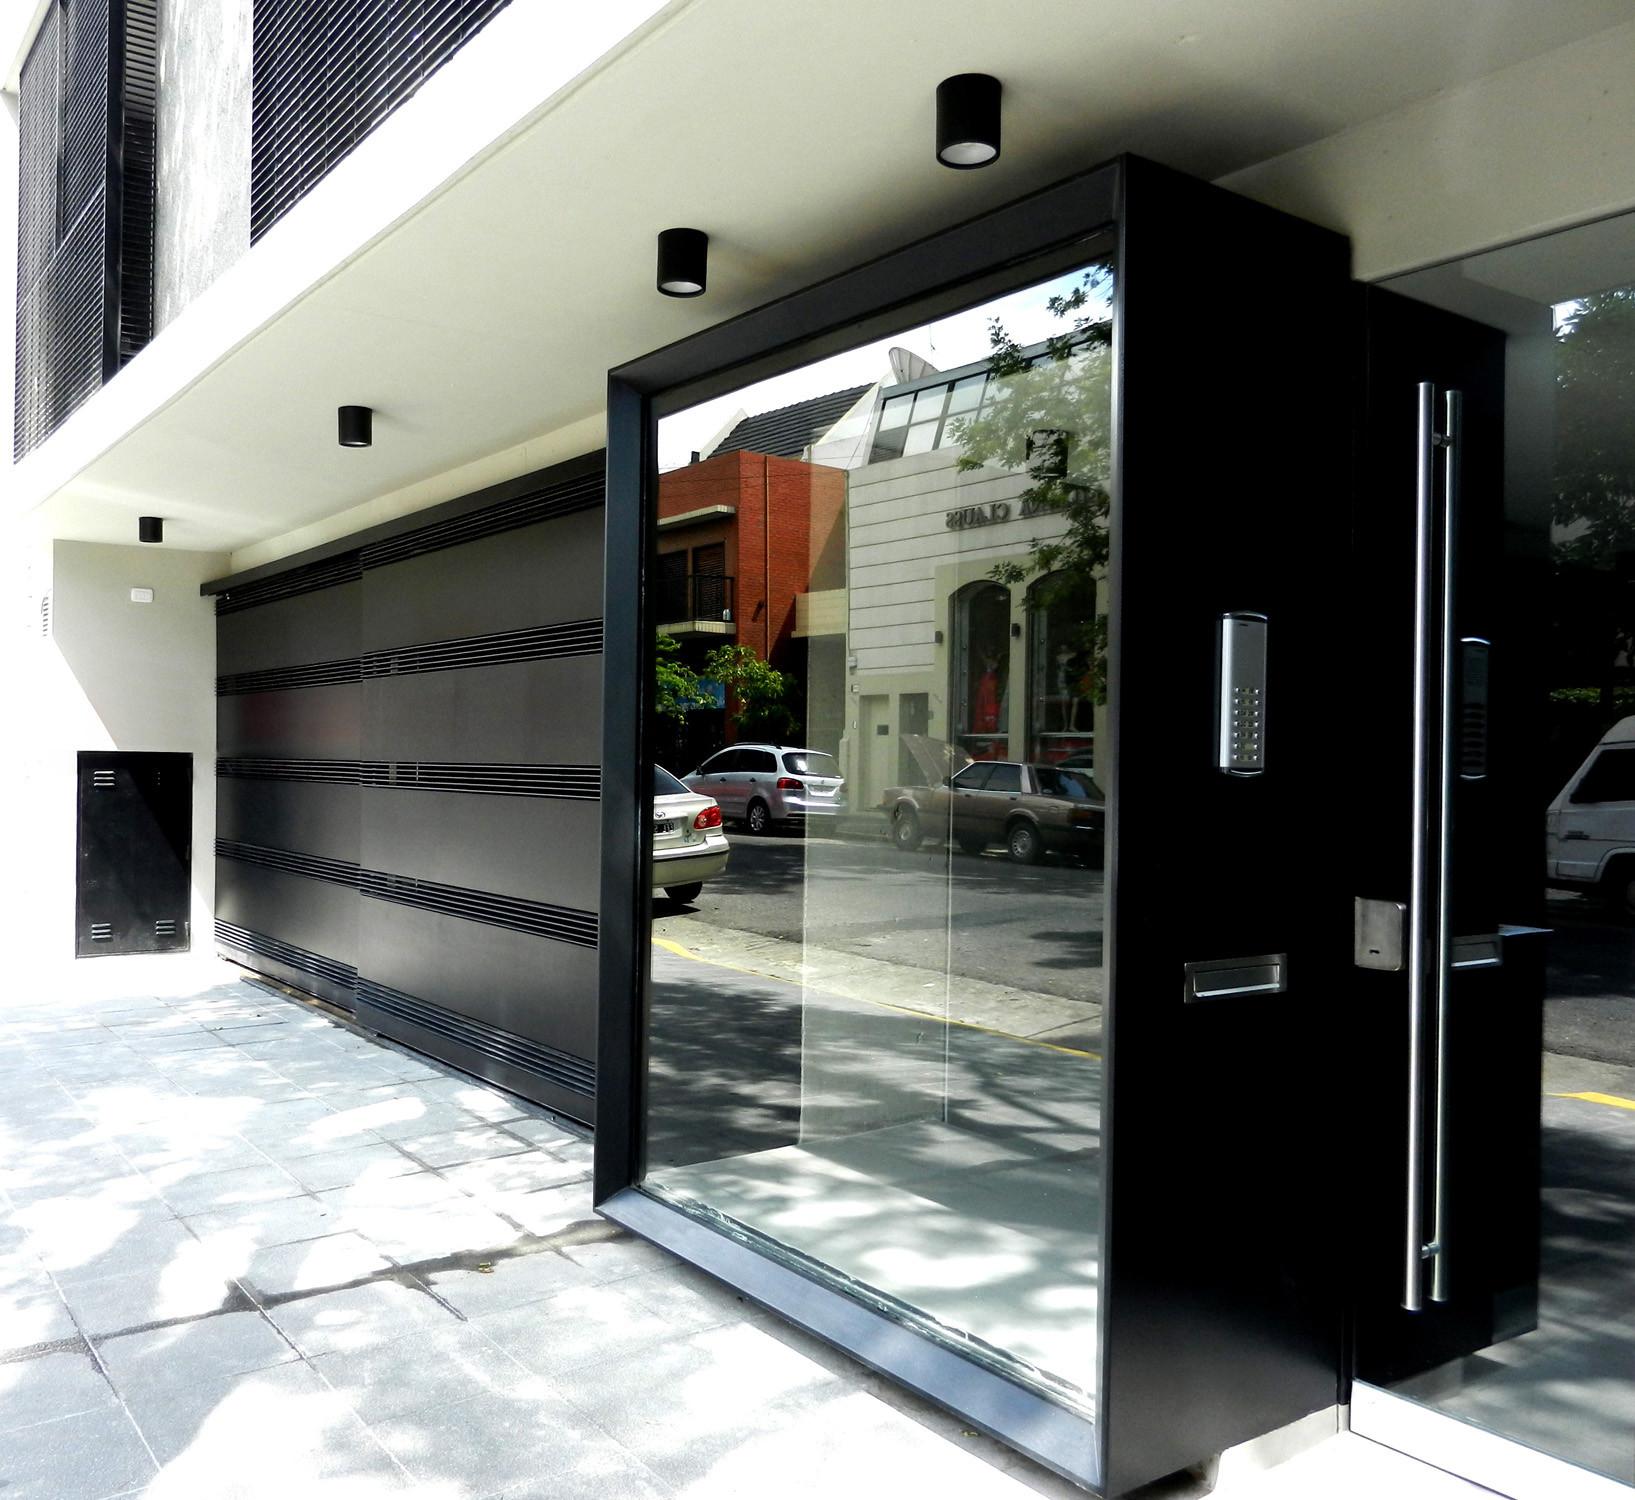 Niceto Vega 4672 / MVS Arquitectos